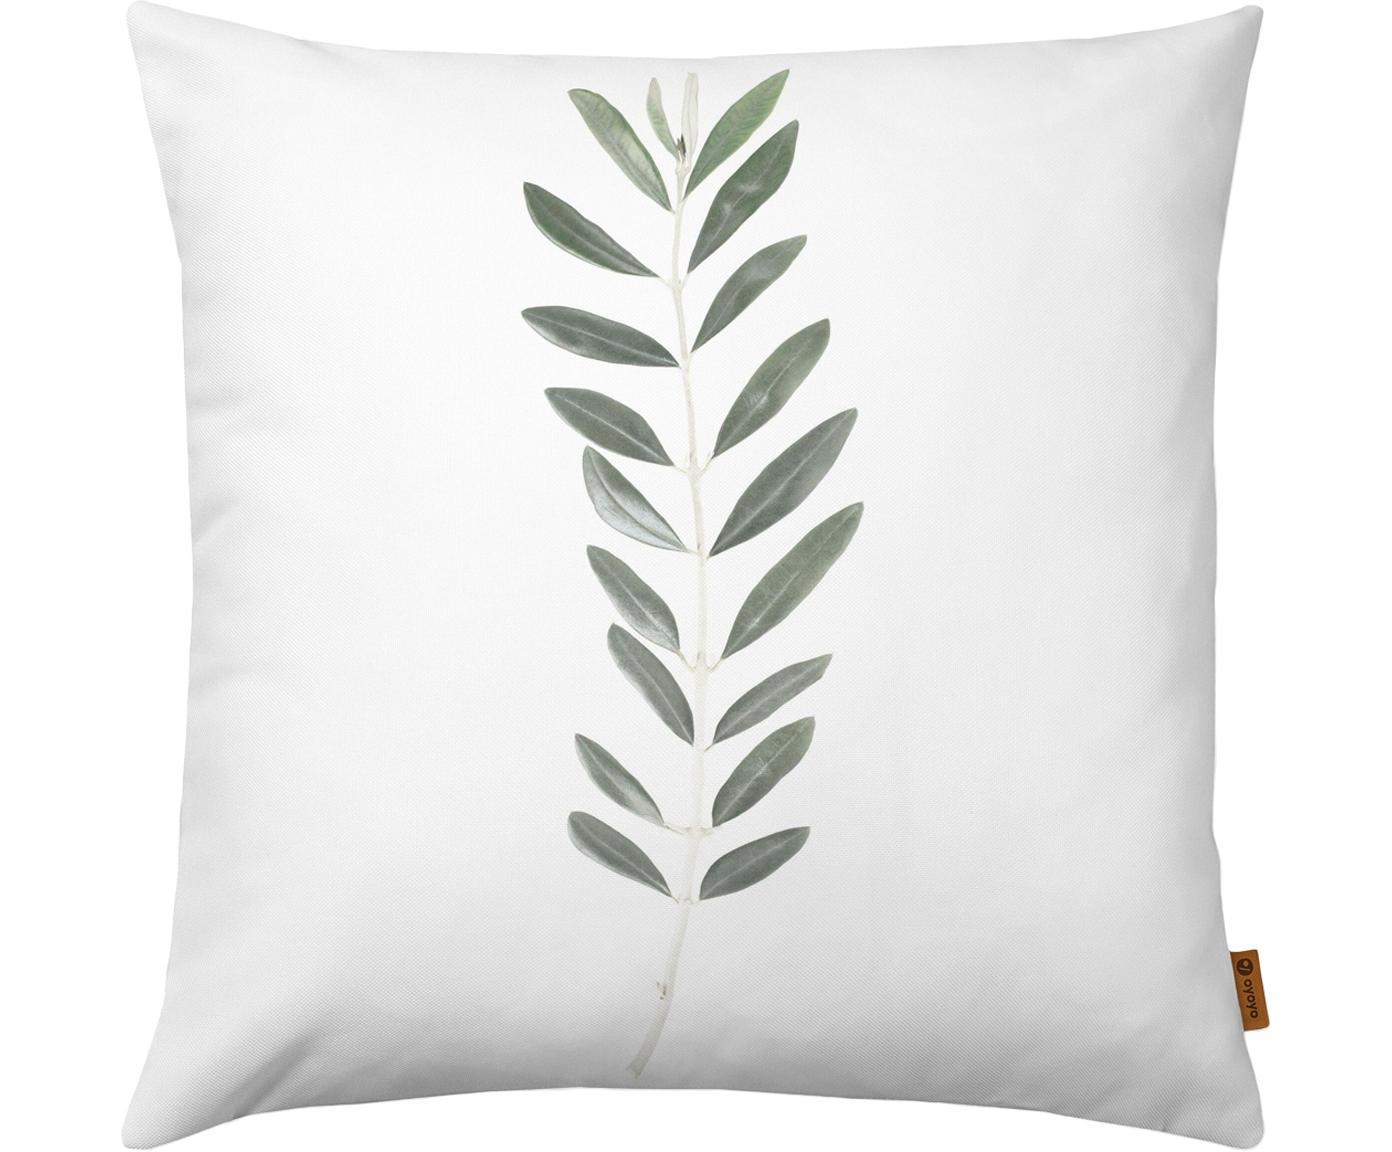 Kussenhoes Botanical met olijftak, Polyester, Wit, groen, 40 x 40 cm